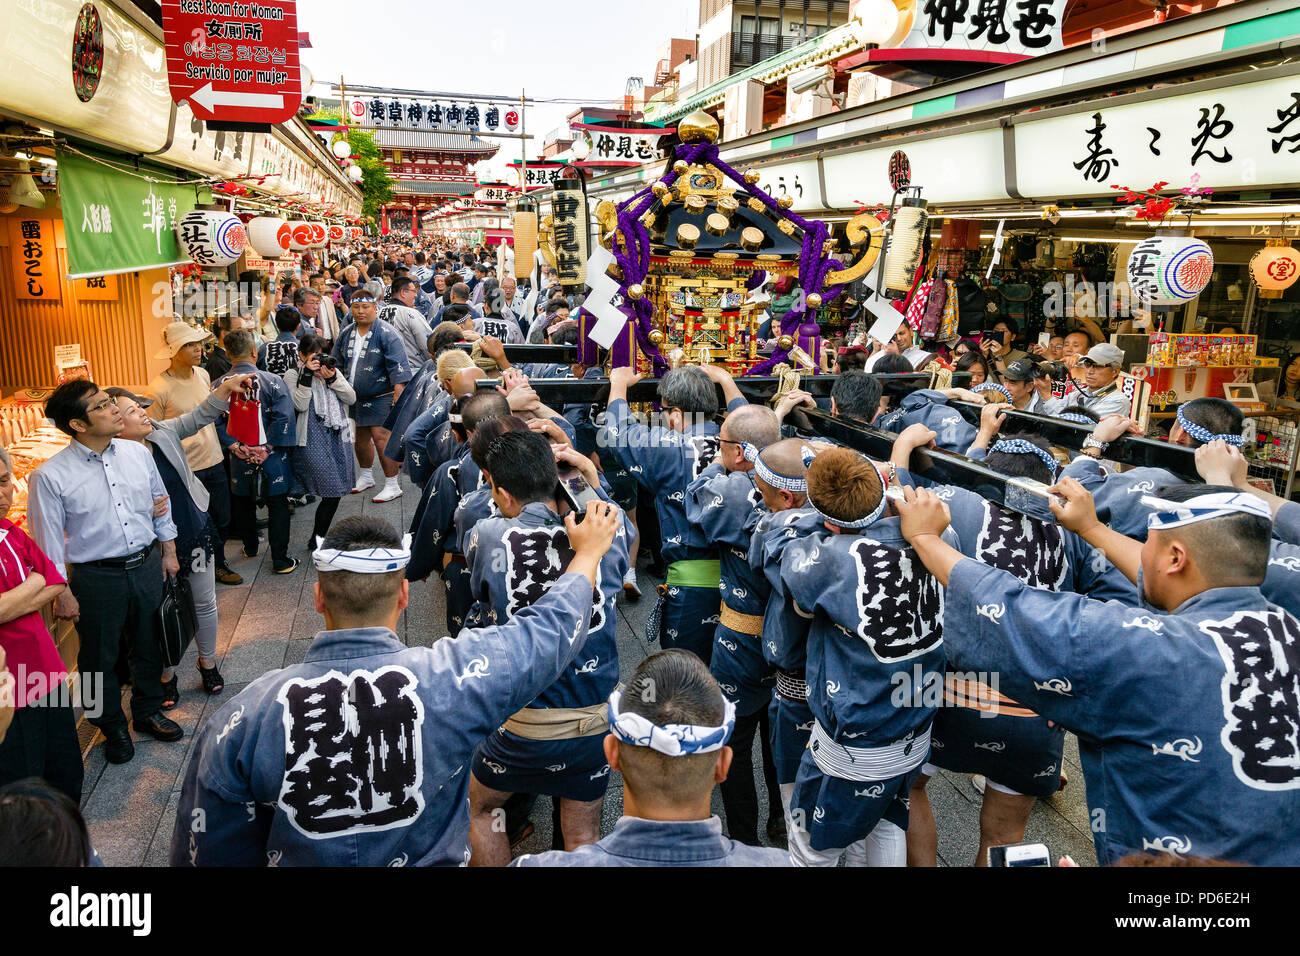 Japan, Insel Honshu, Kanto, Tokio, die Sanja matsuri. Stockbild